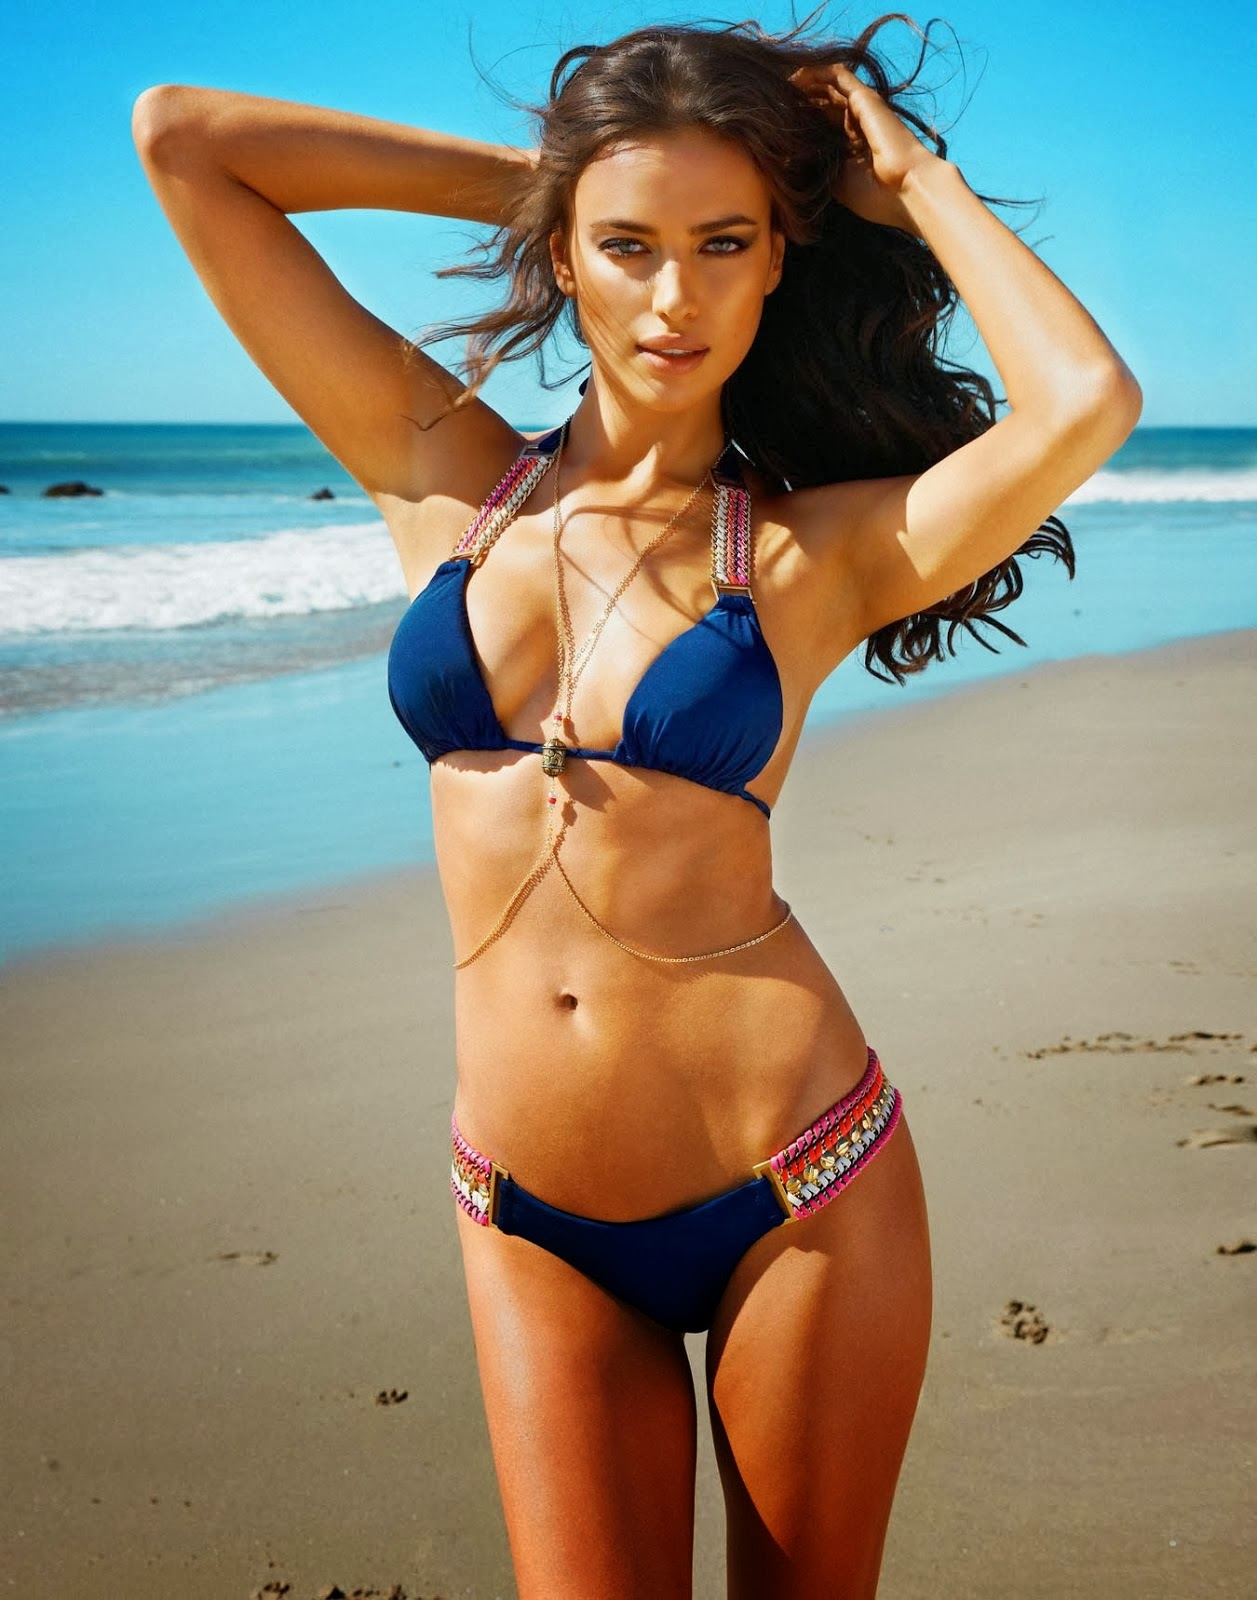 Fuck Irina Shayk nude (15 foto and video), Ass, Bikini, Boobs, swimsuit 2019